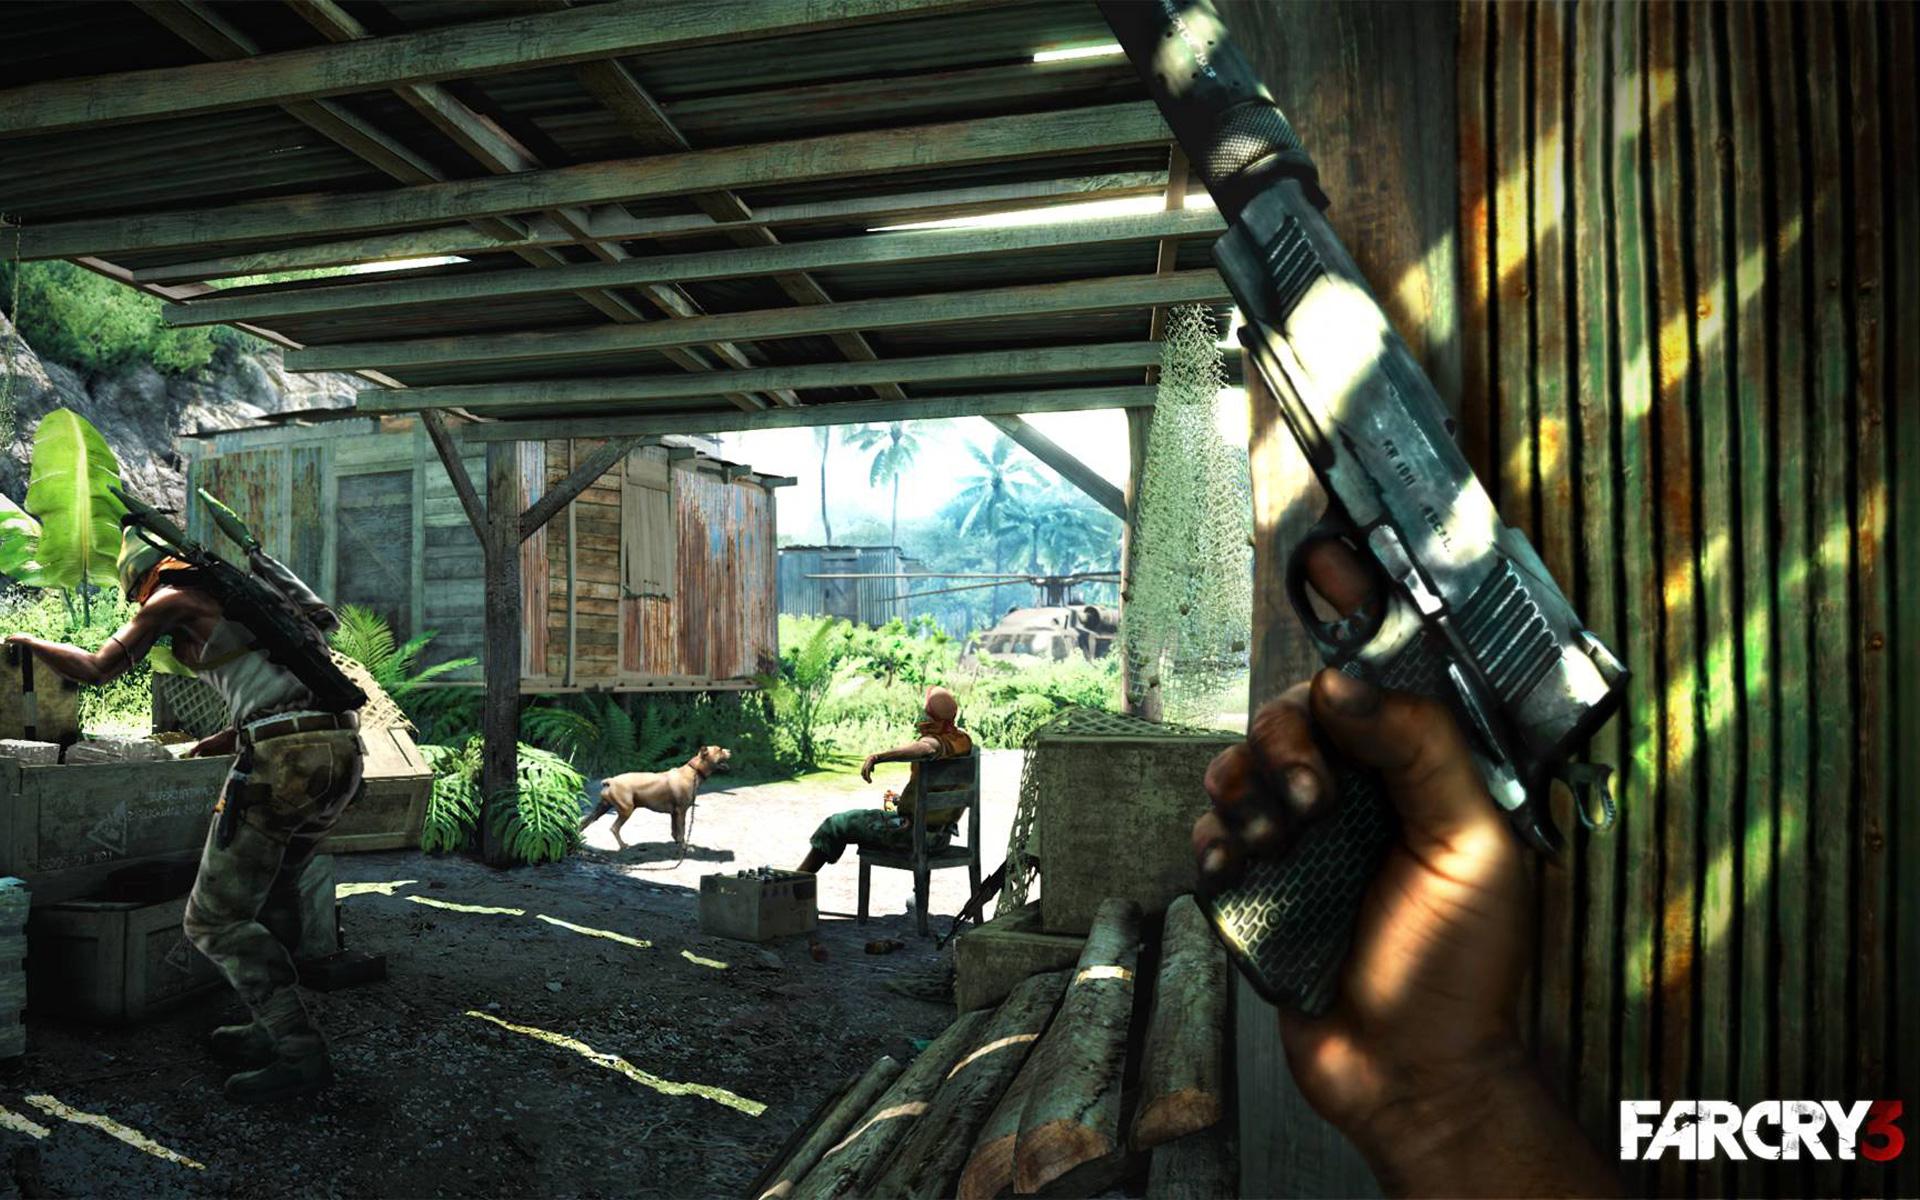 Free Far Cry 3 Wallpaper in 1920x1200